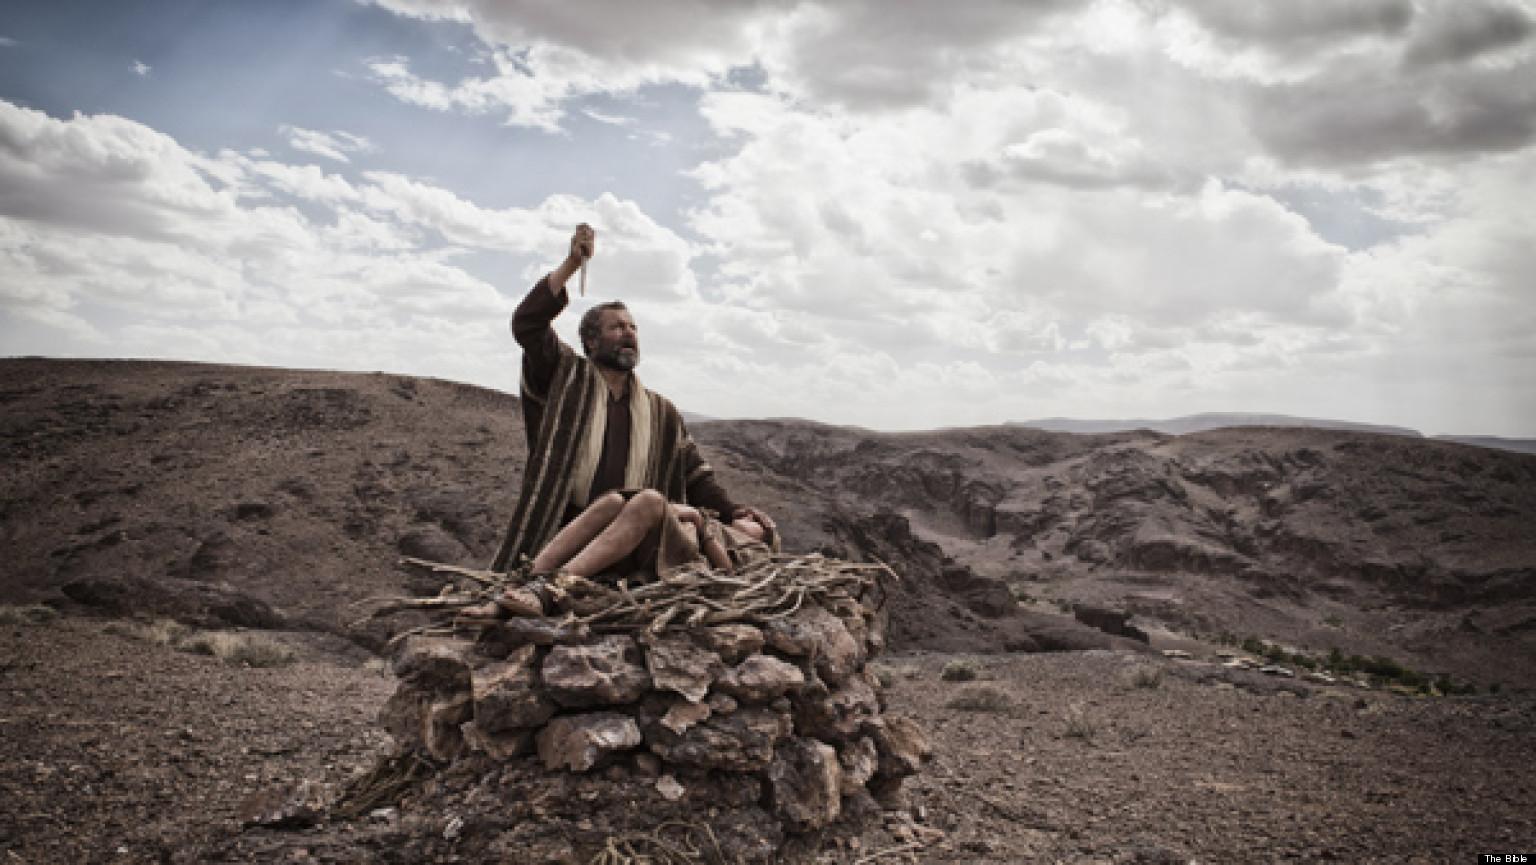 biblical imagery